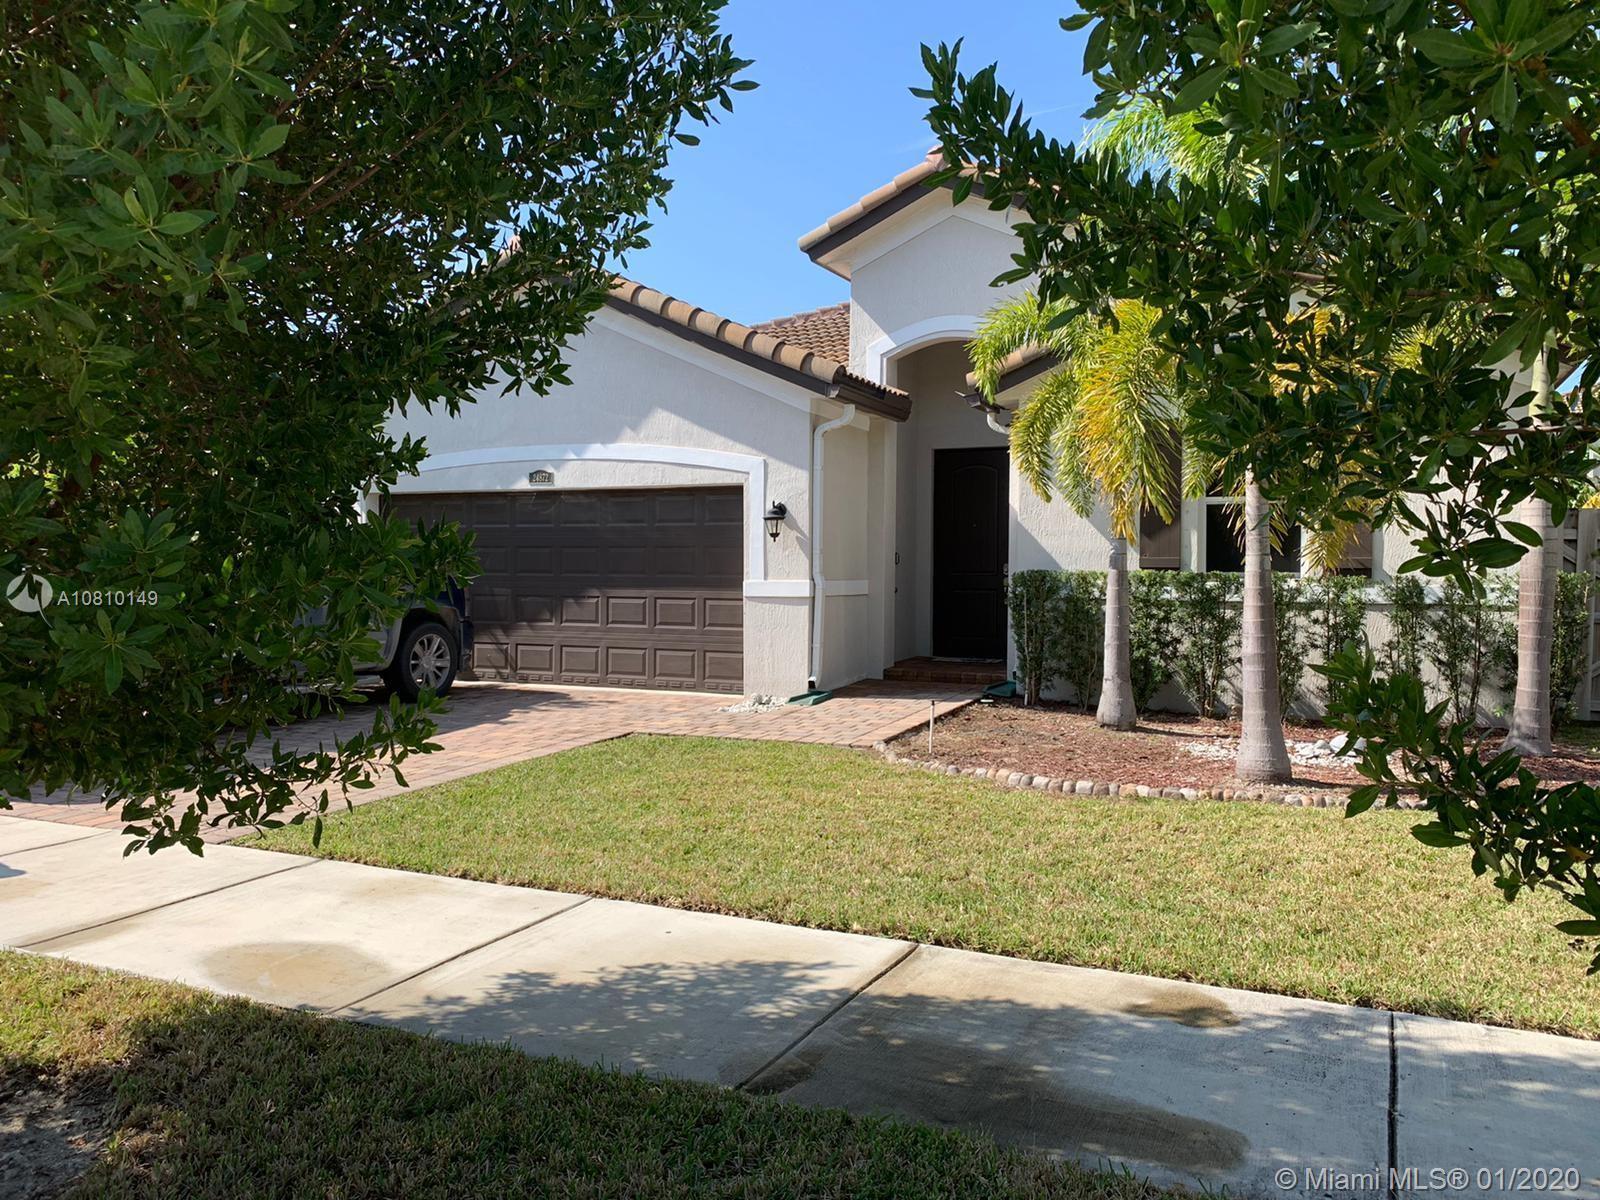 24872 SW 118 Ct #n/a, Homestead, FL 33032 - Homestead, FL real estate listing